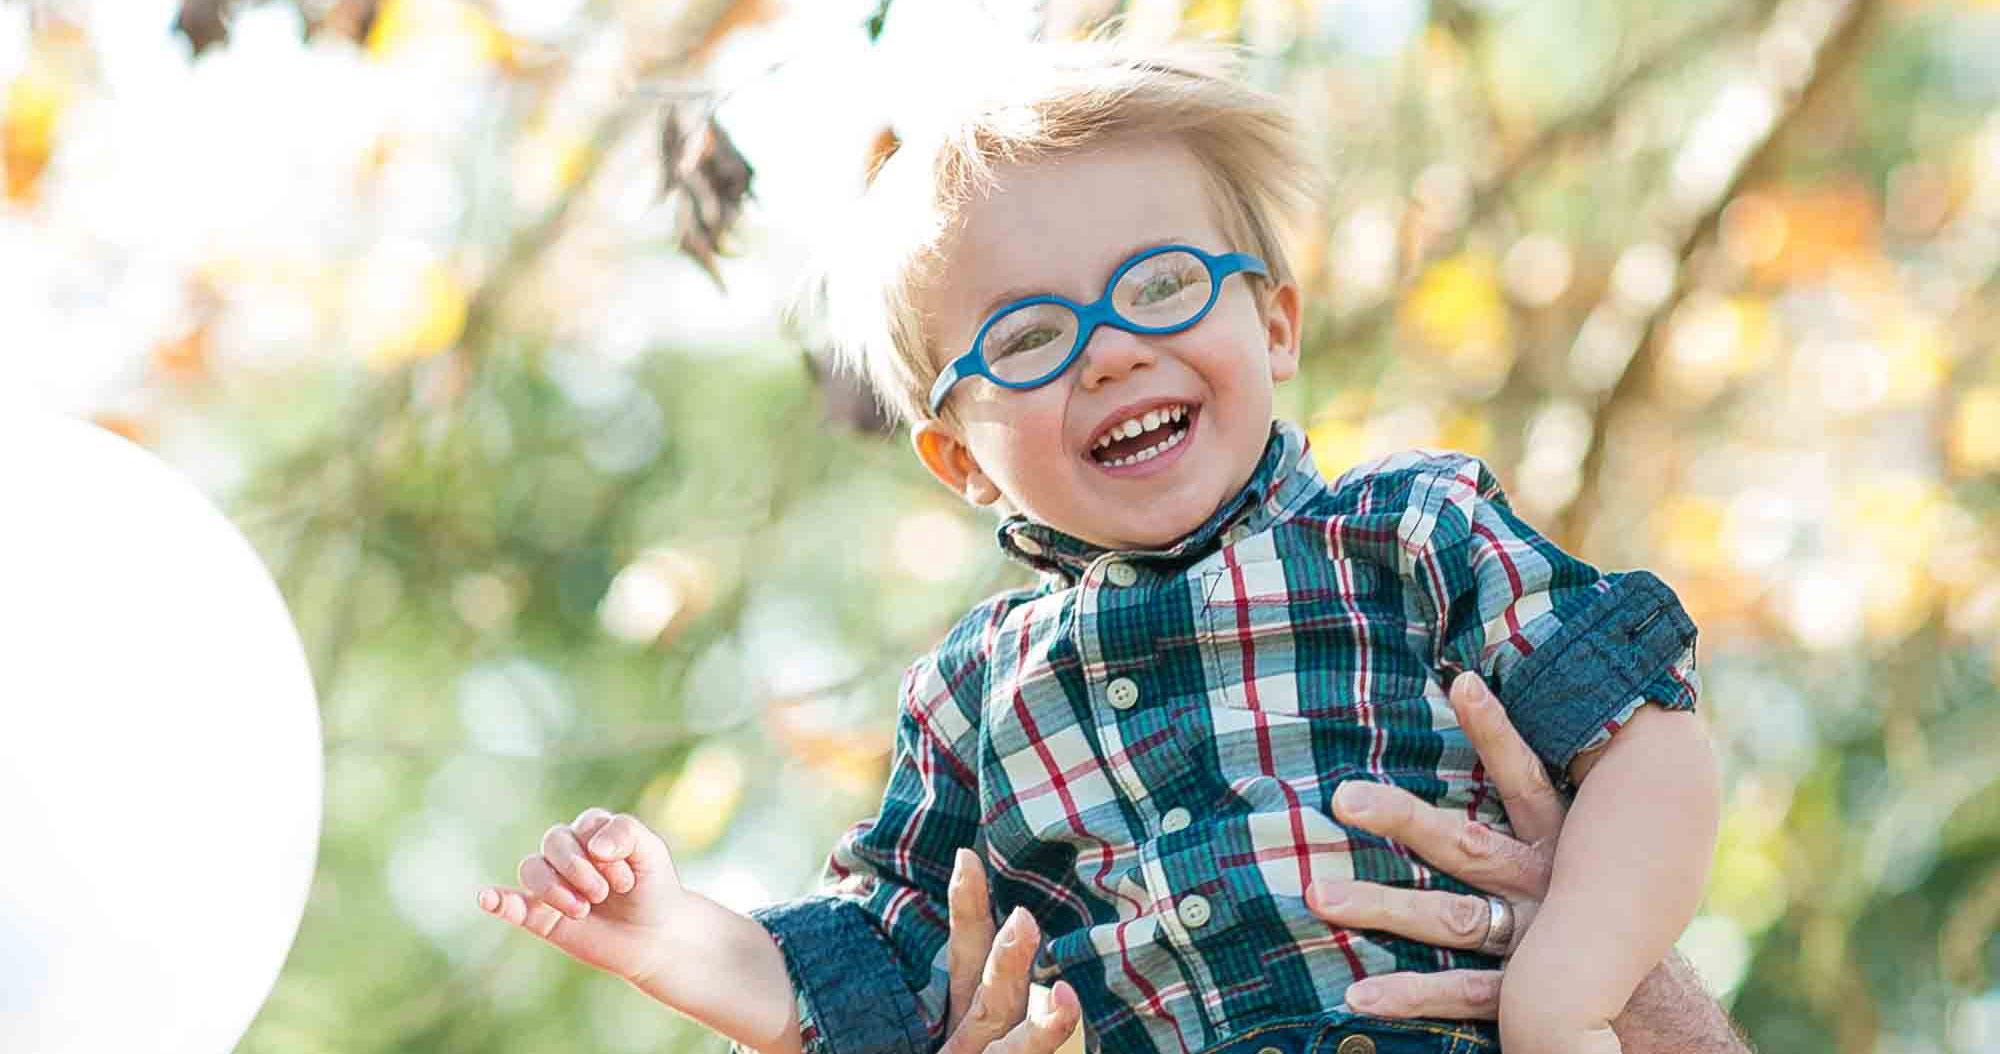 Hamm Family Portrait featured slider image